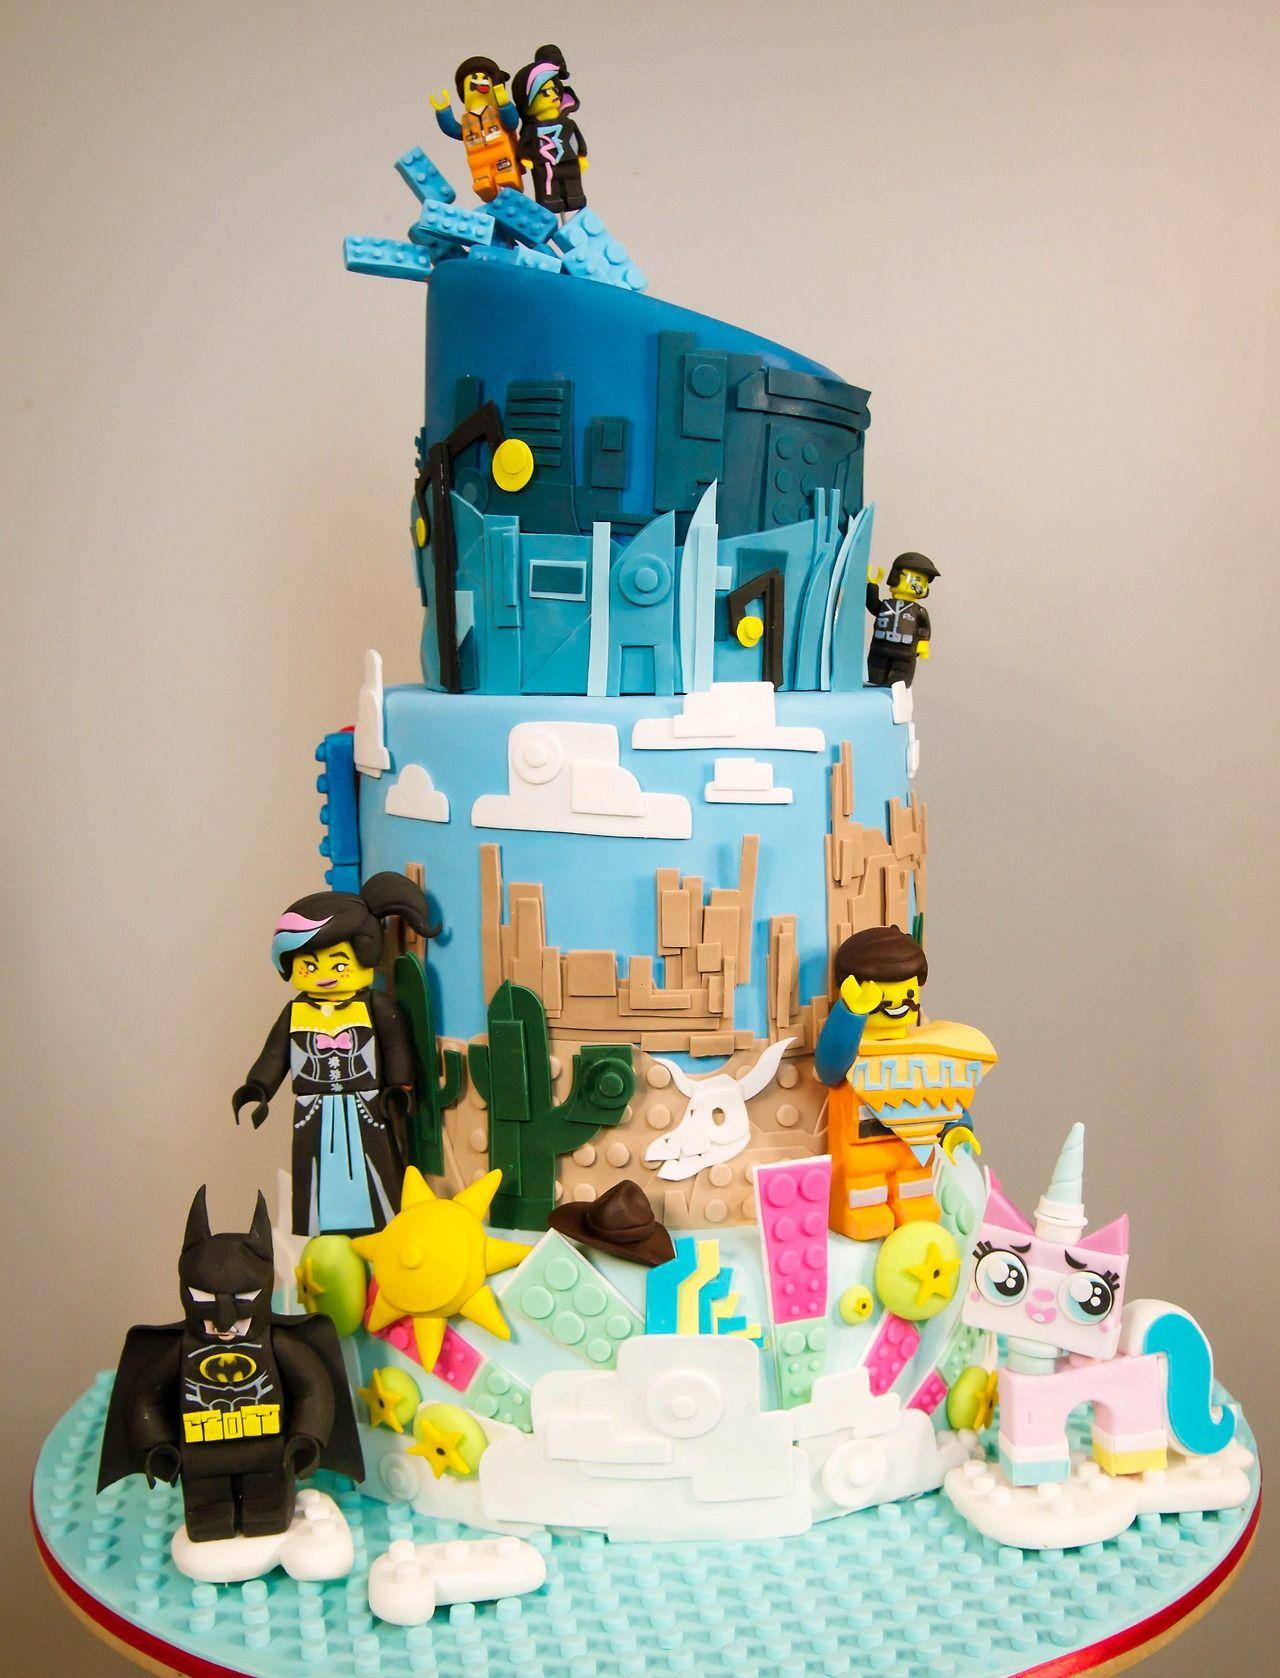 The Lego Movie Cake To End All Lego Movie Cakes